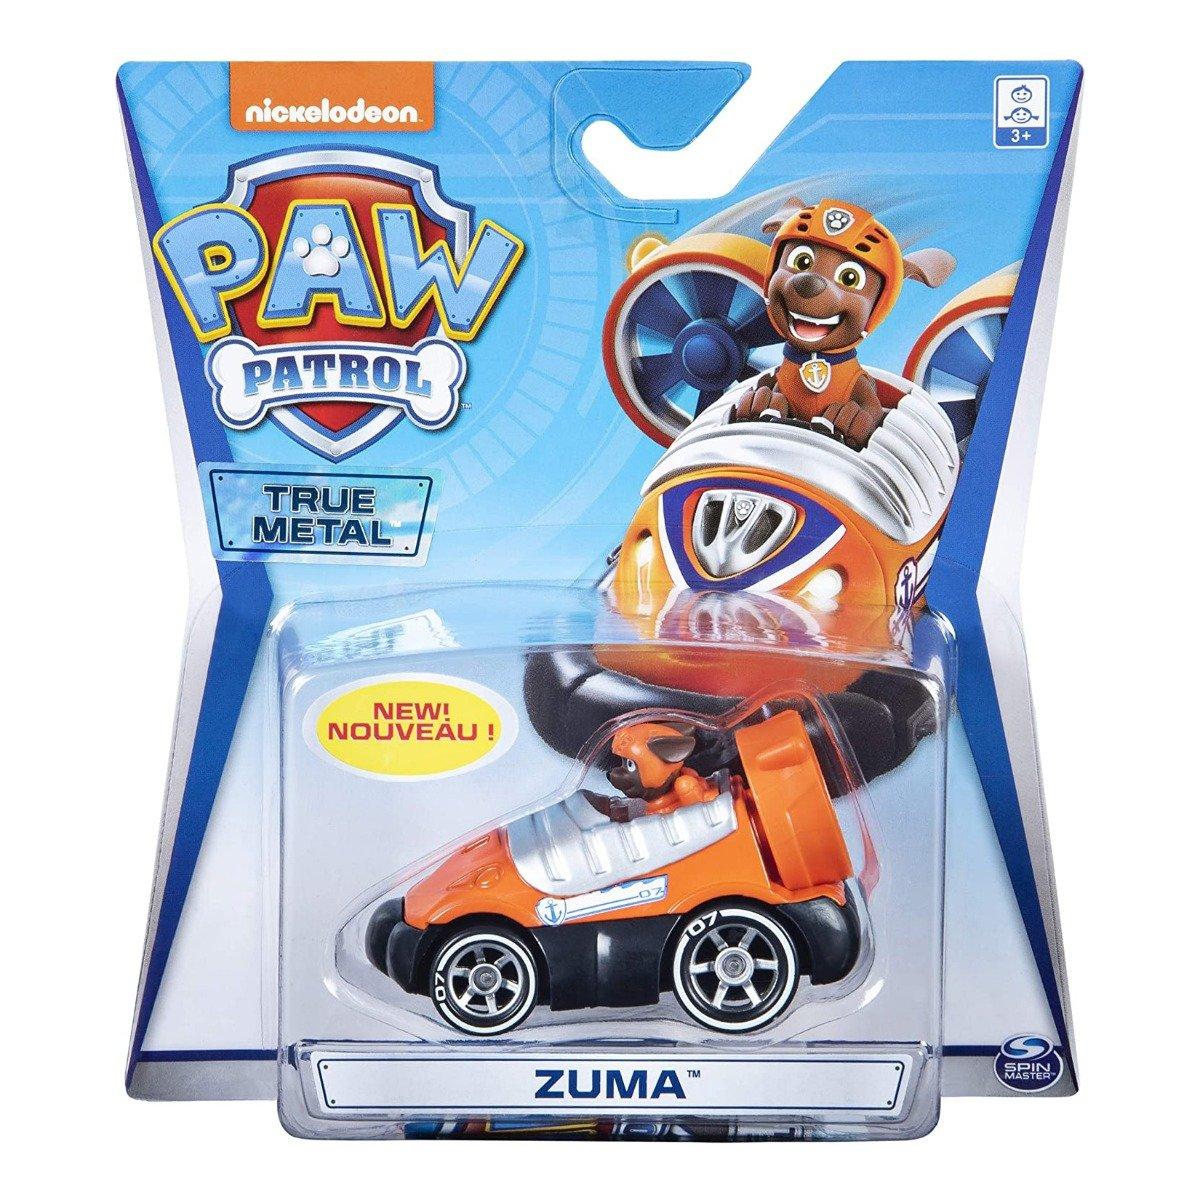 Masinuta cu figurina Paw Patrol True Metal, Zuma 20121384